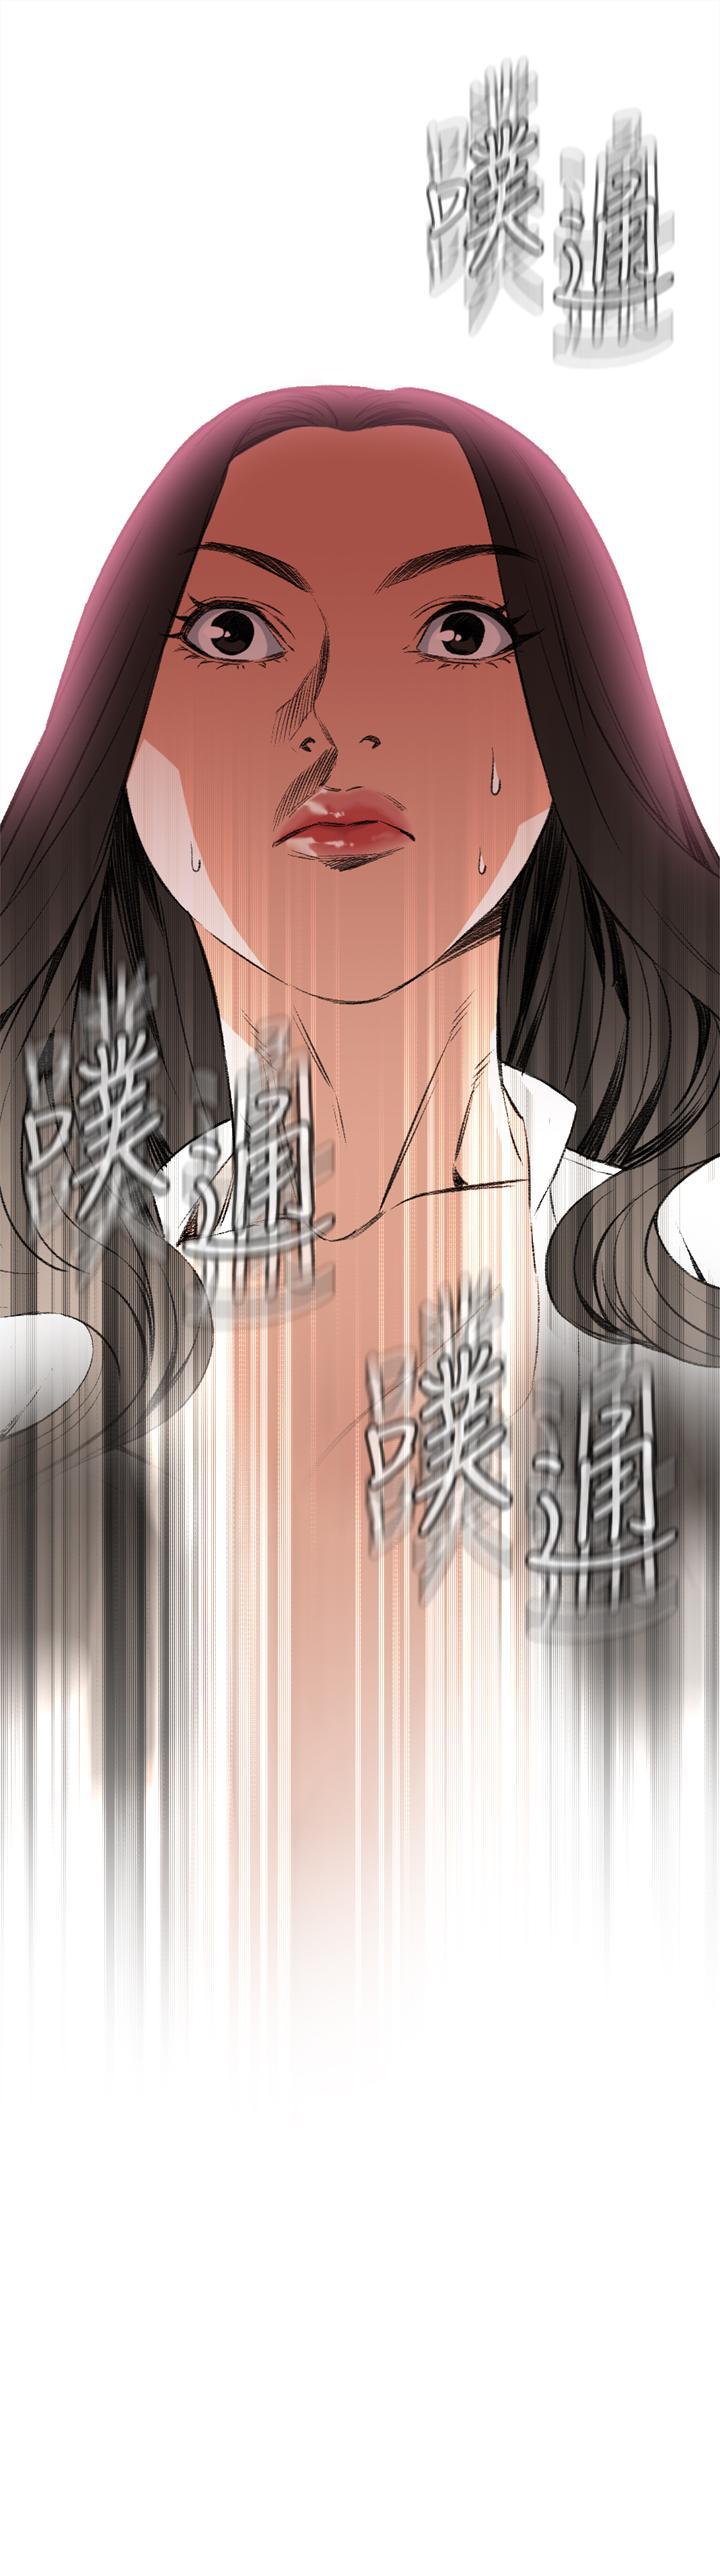 Take a Peek 偷窥 Ch.39~51 [Chinese]中文 256